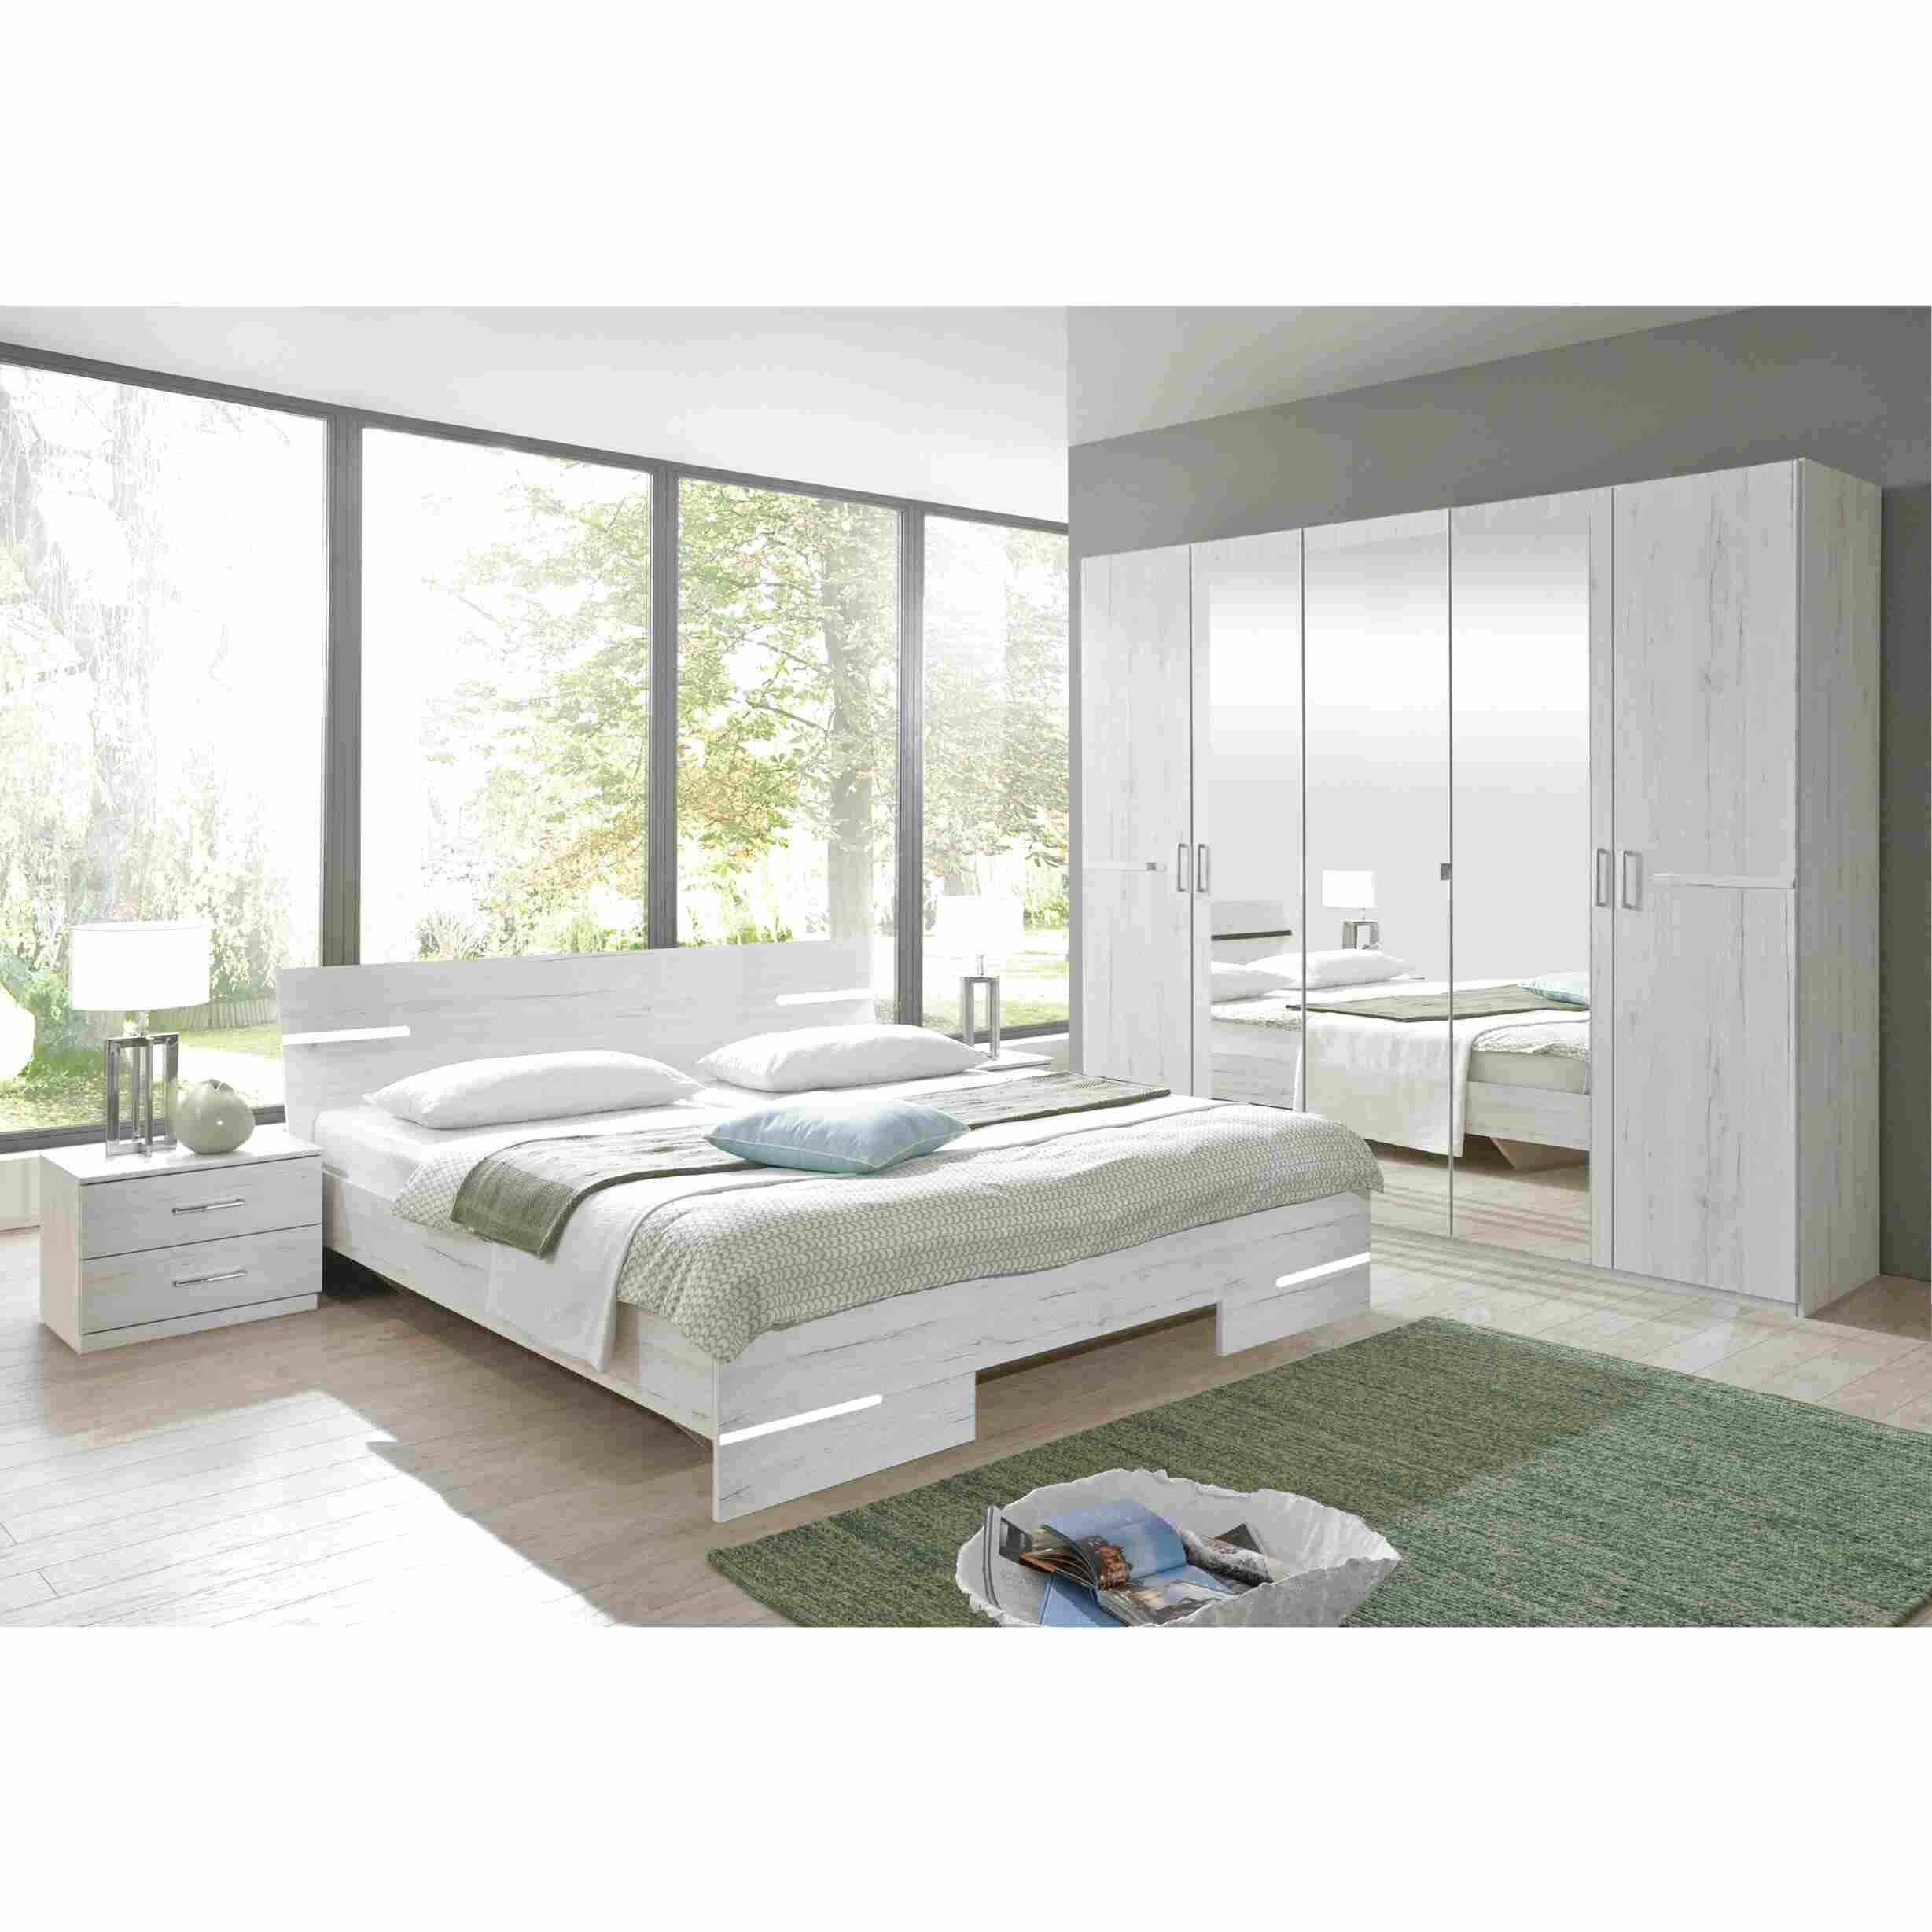 qmax german bedroom for sale